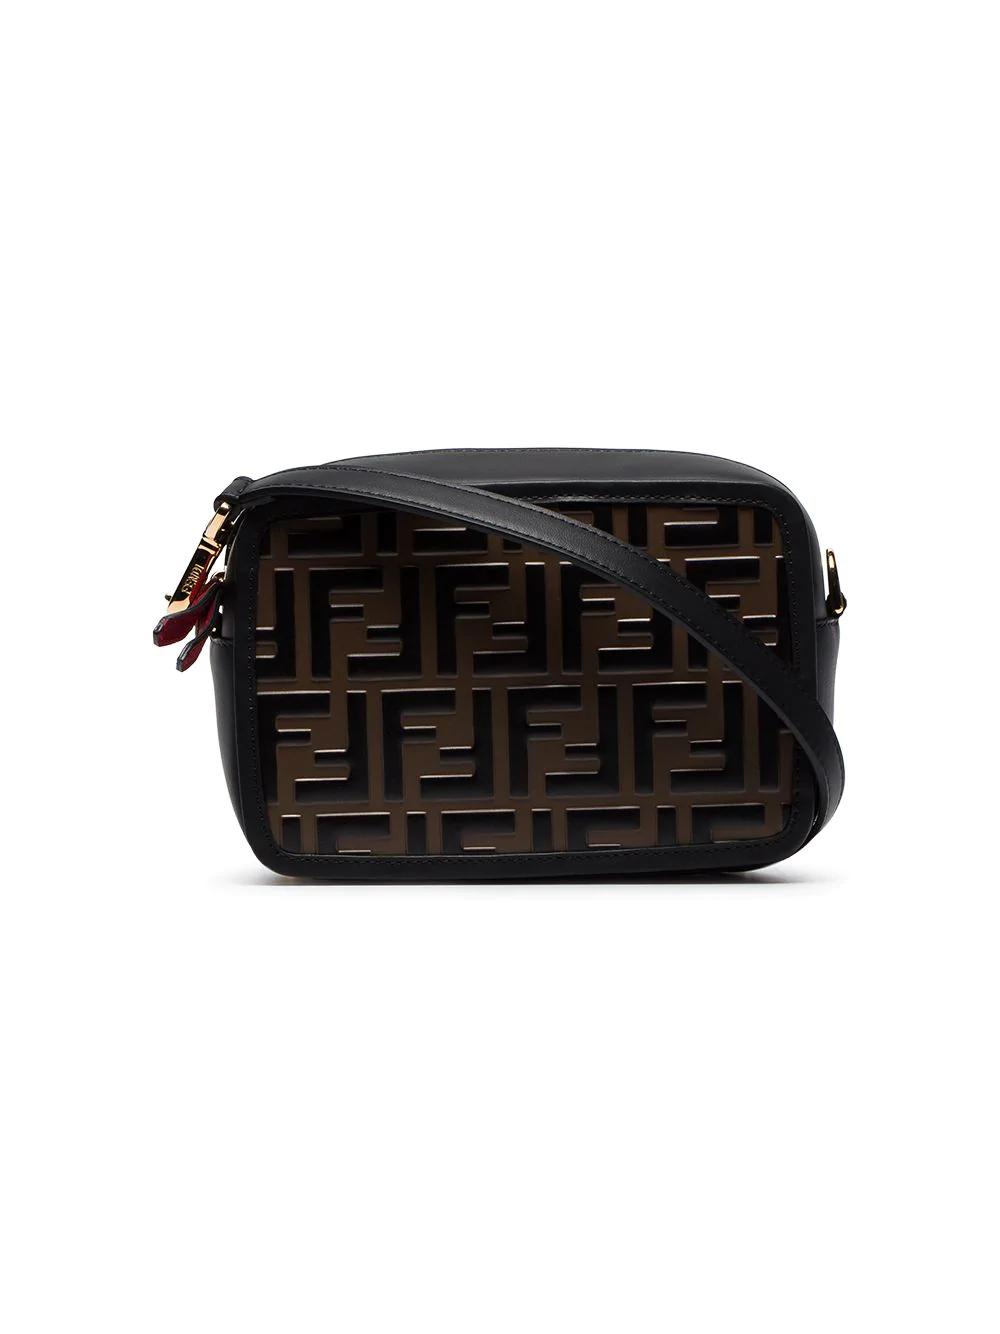 943a483f83f5 Fendi Black And Brown Ff Logo Mini Leather Camera Bag. Farfetch